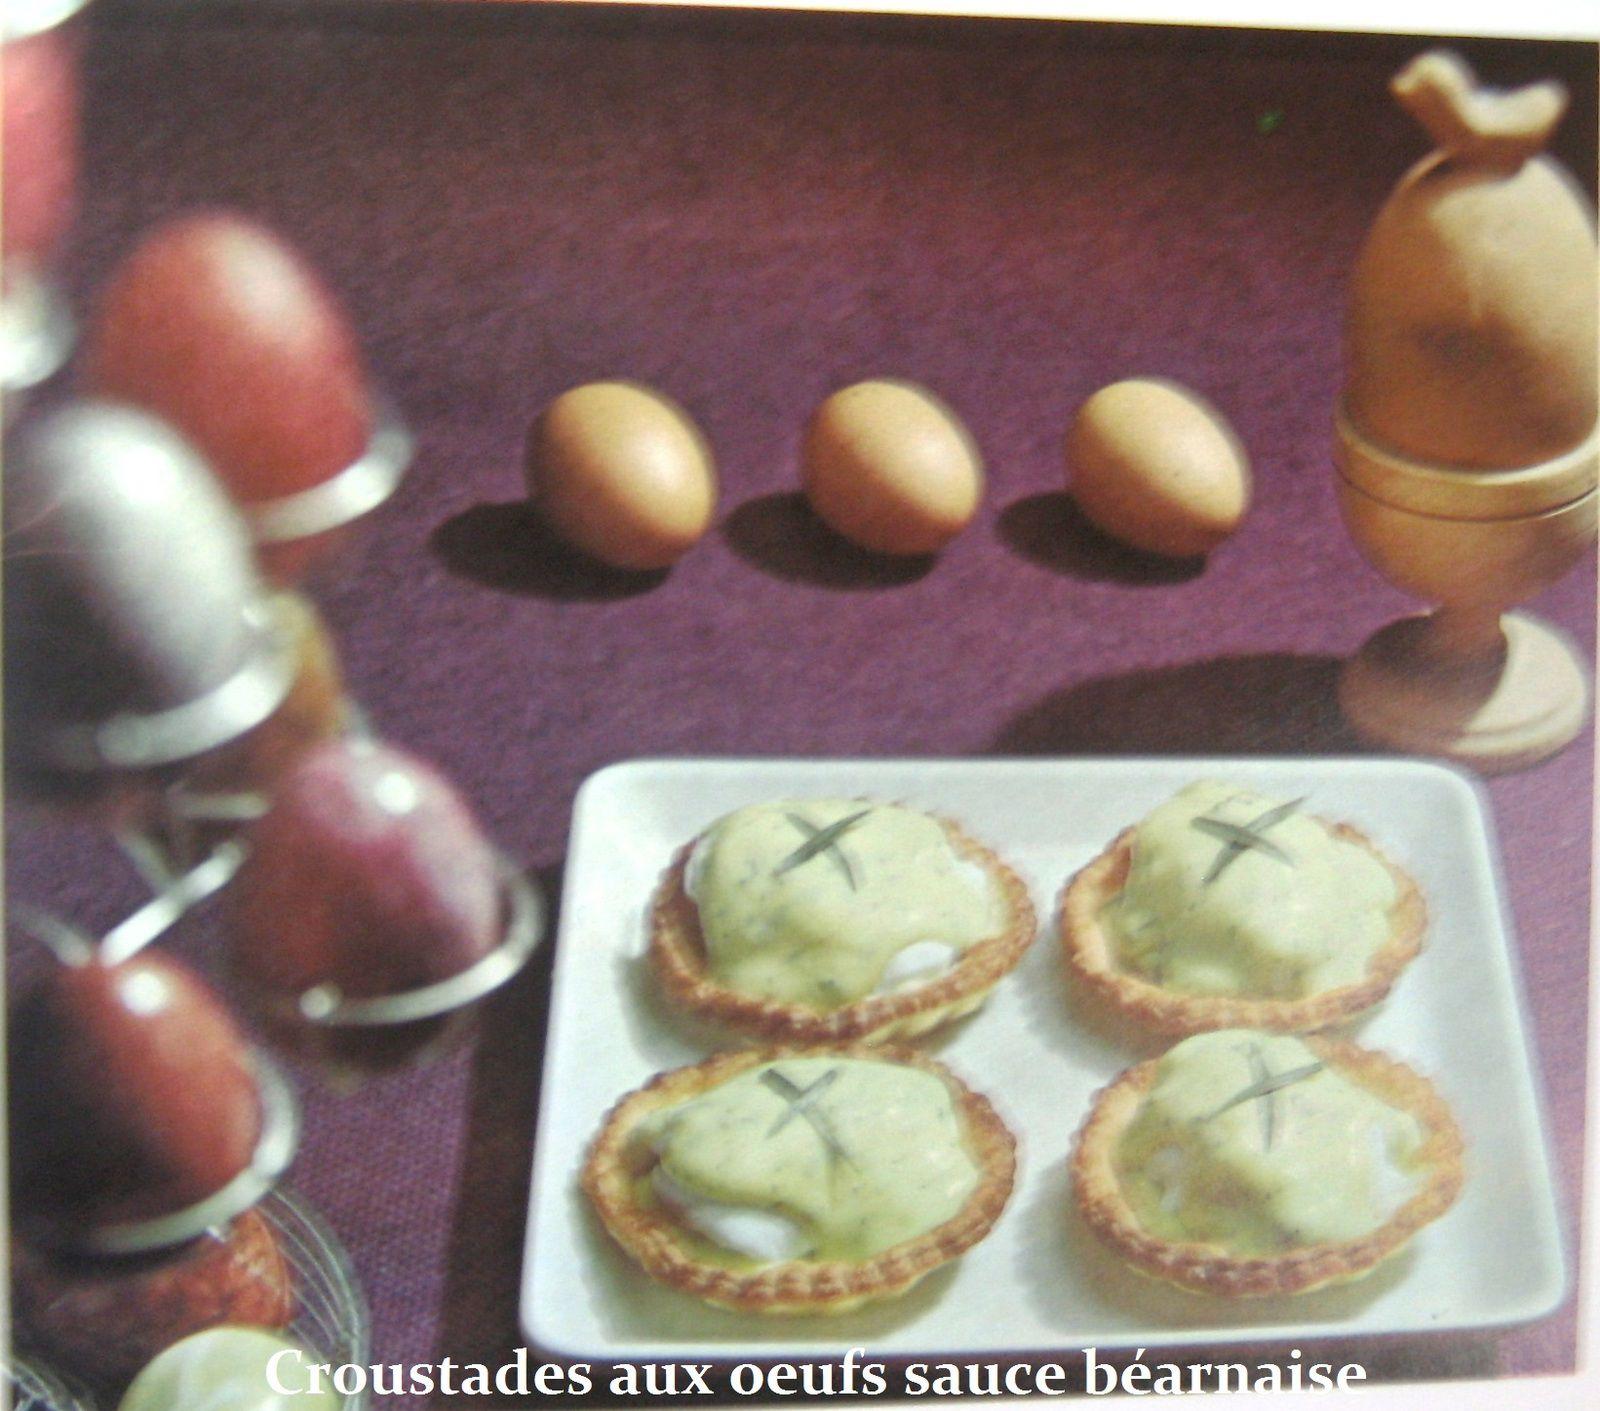 Croustades aux œufs sauce béarnaise